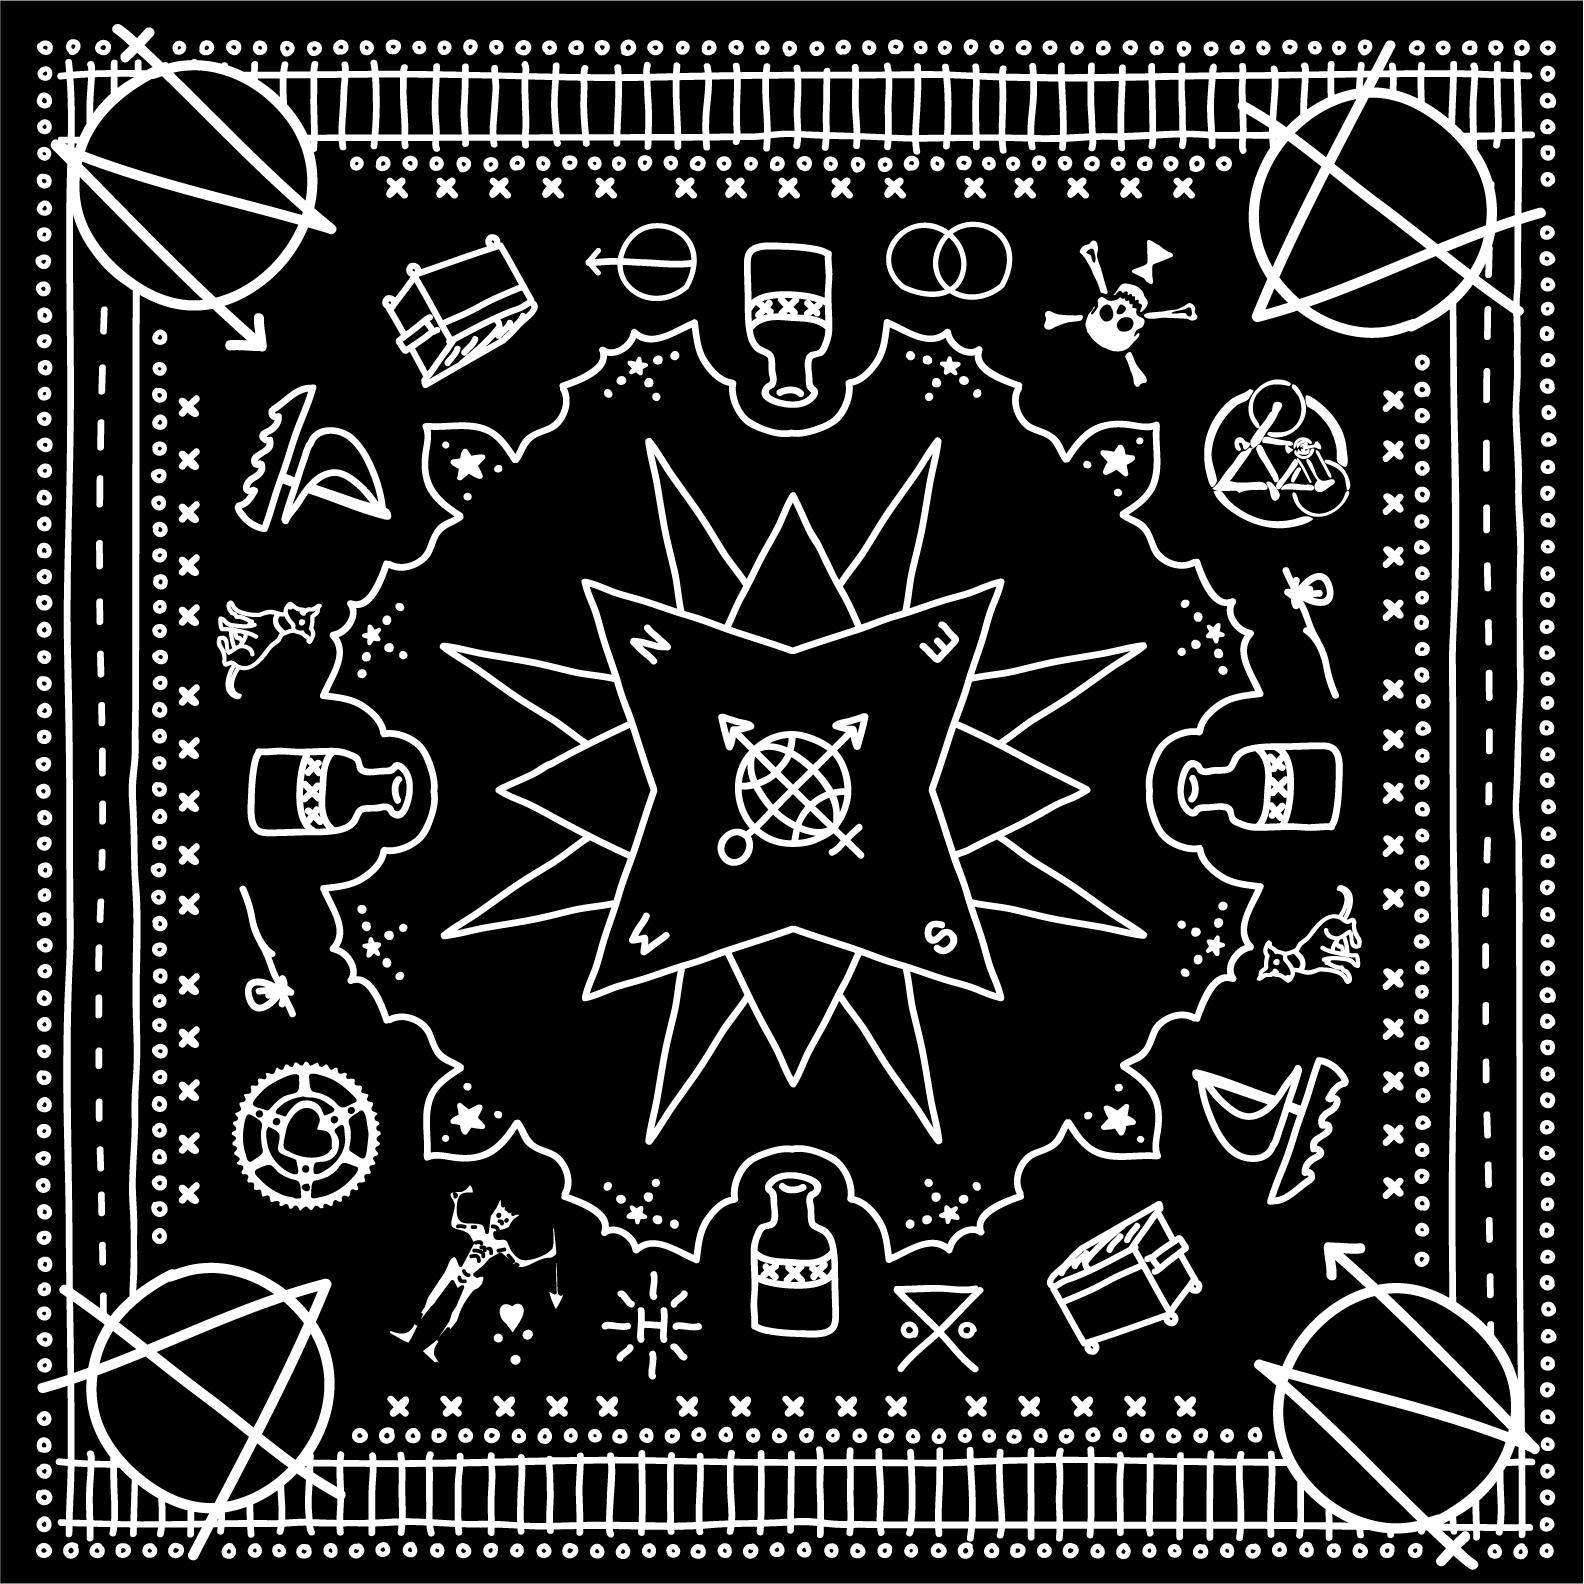 bandkerchief_stpversion-jpg.17275